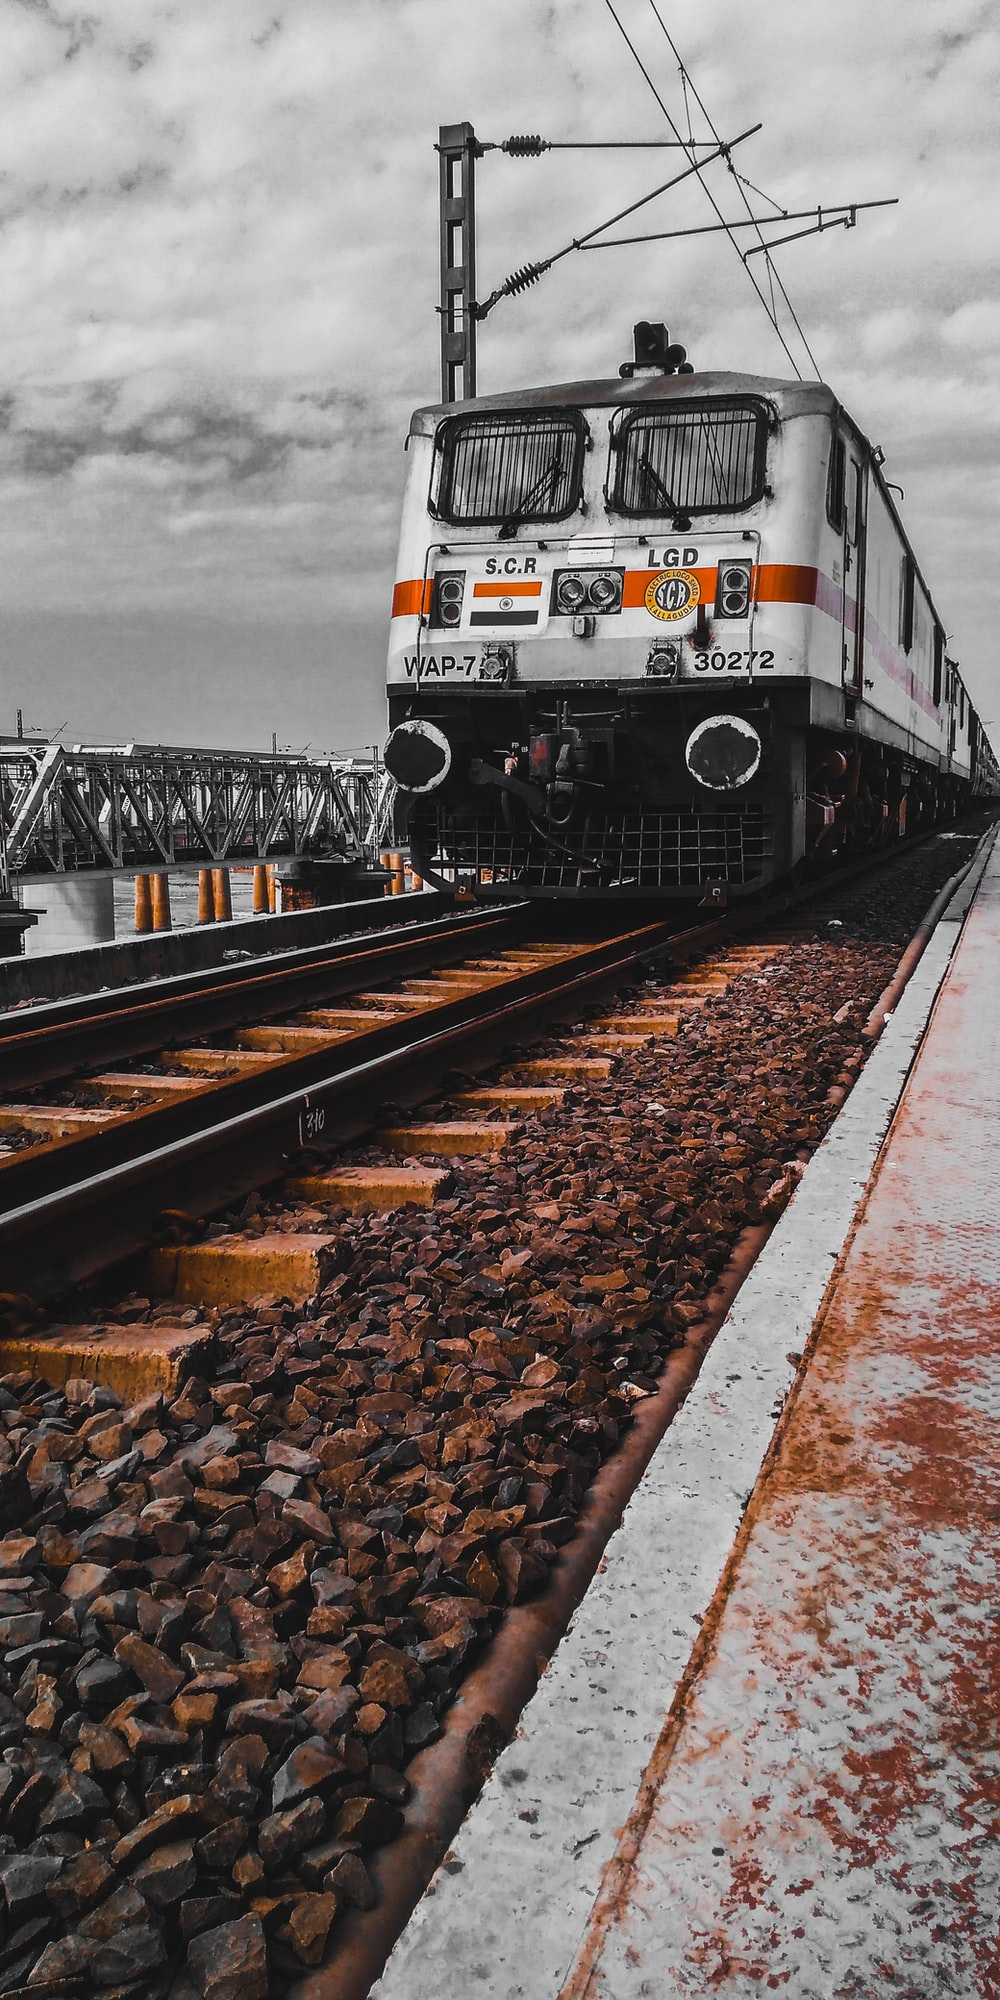 white and black train on rail tracks